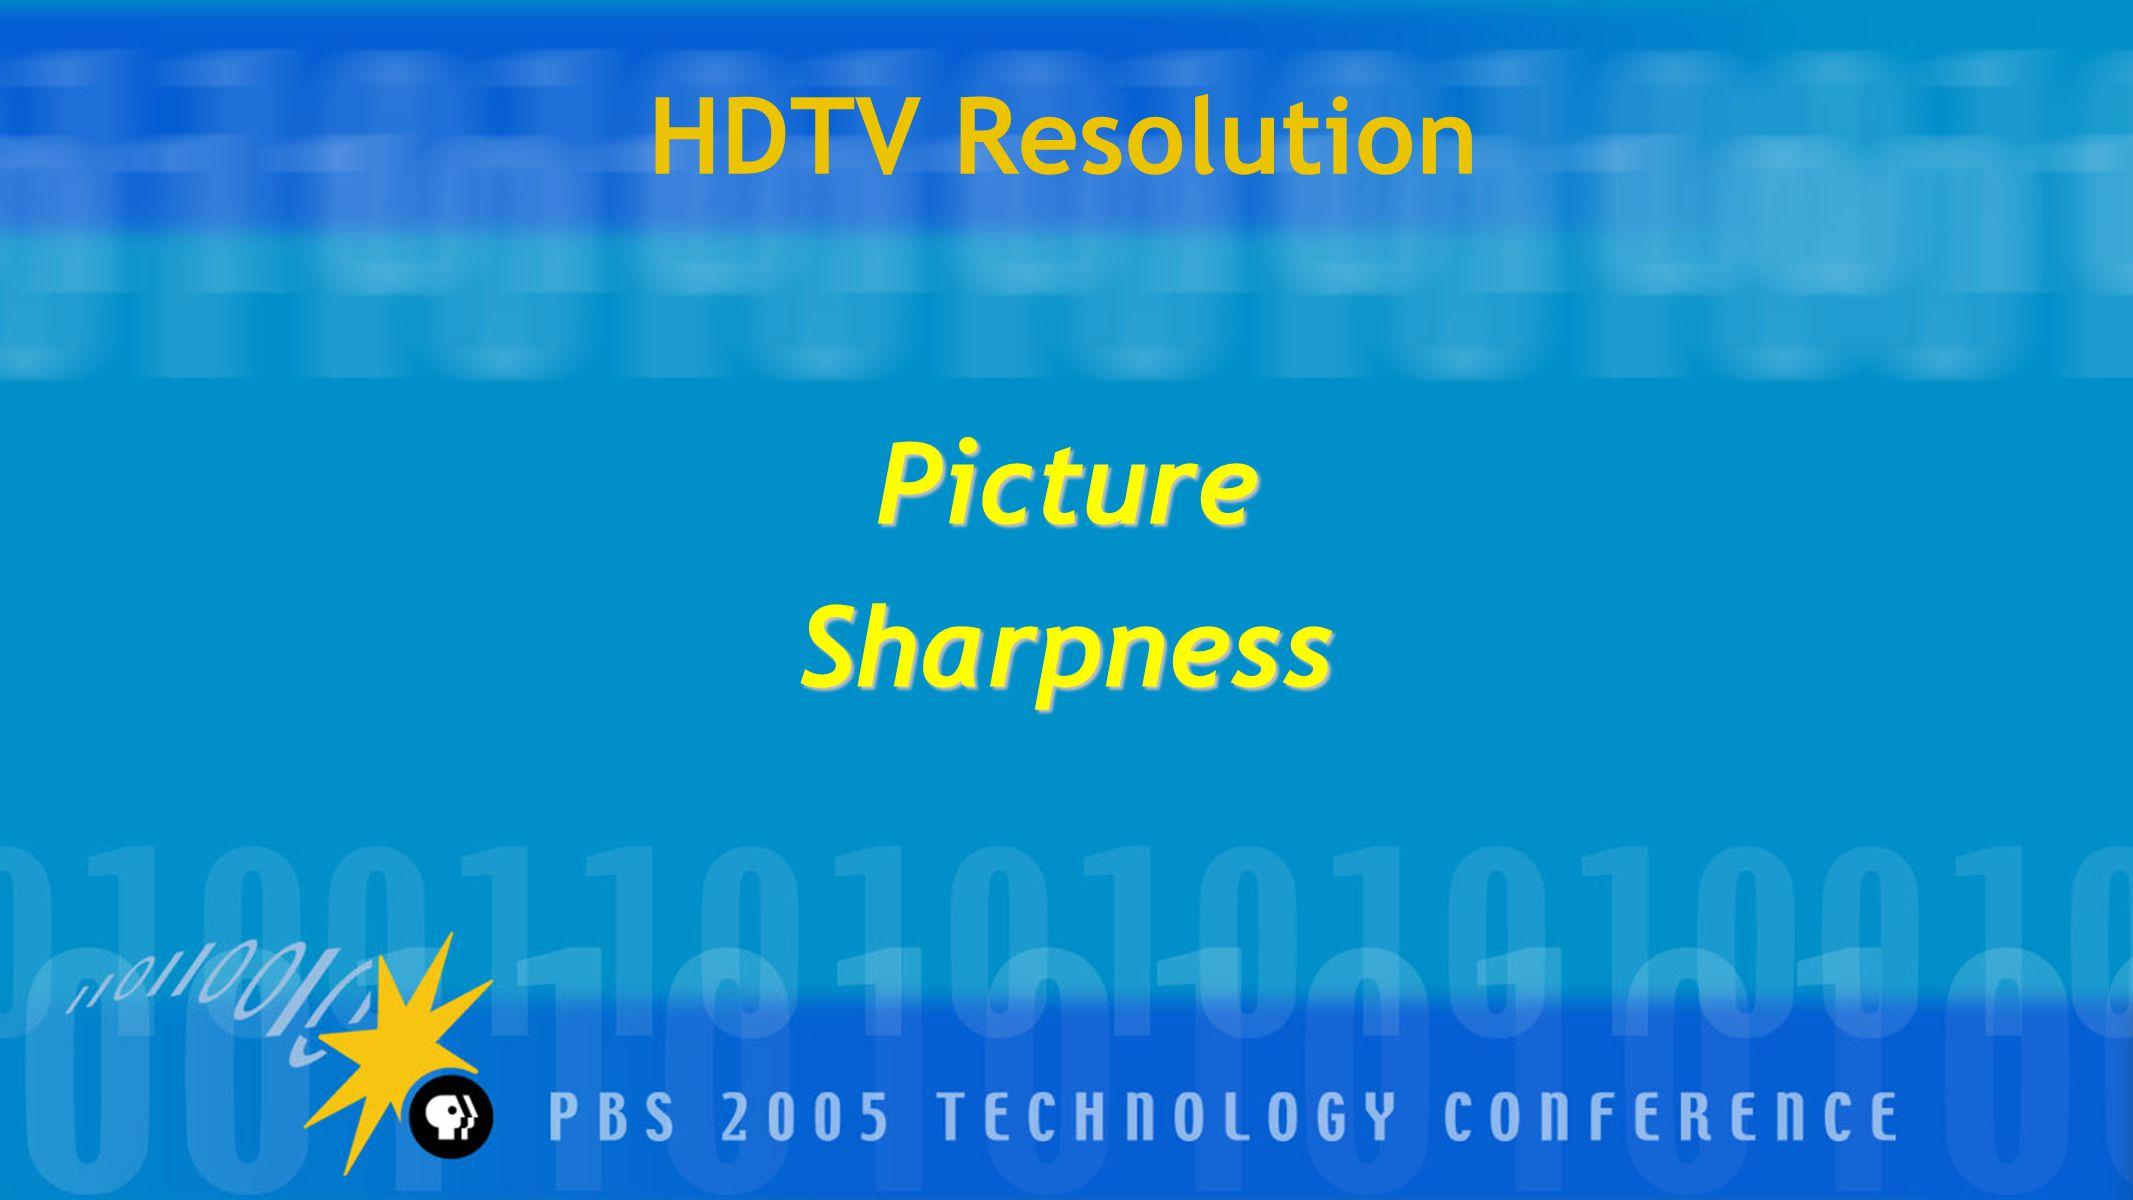 HDTV Resolution PictureSharpness